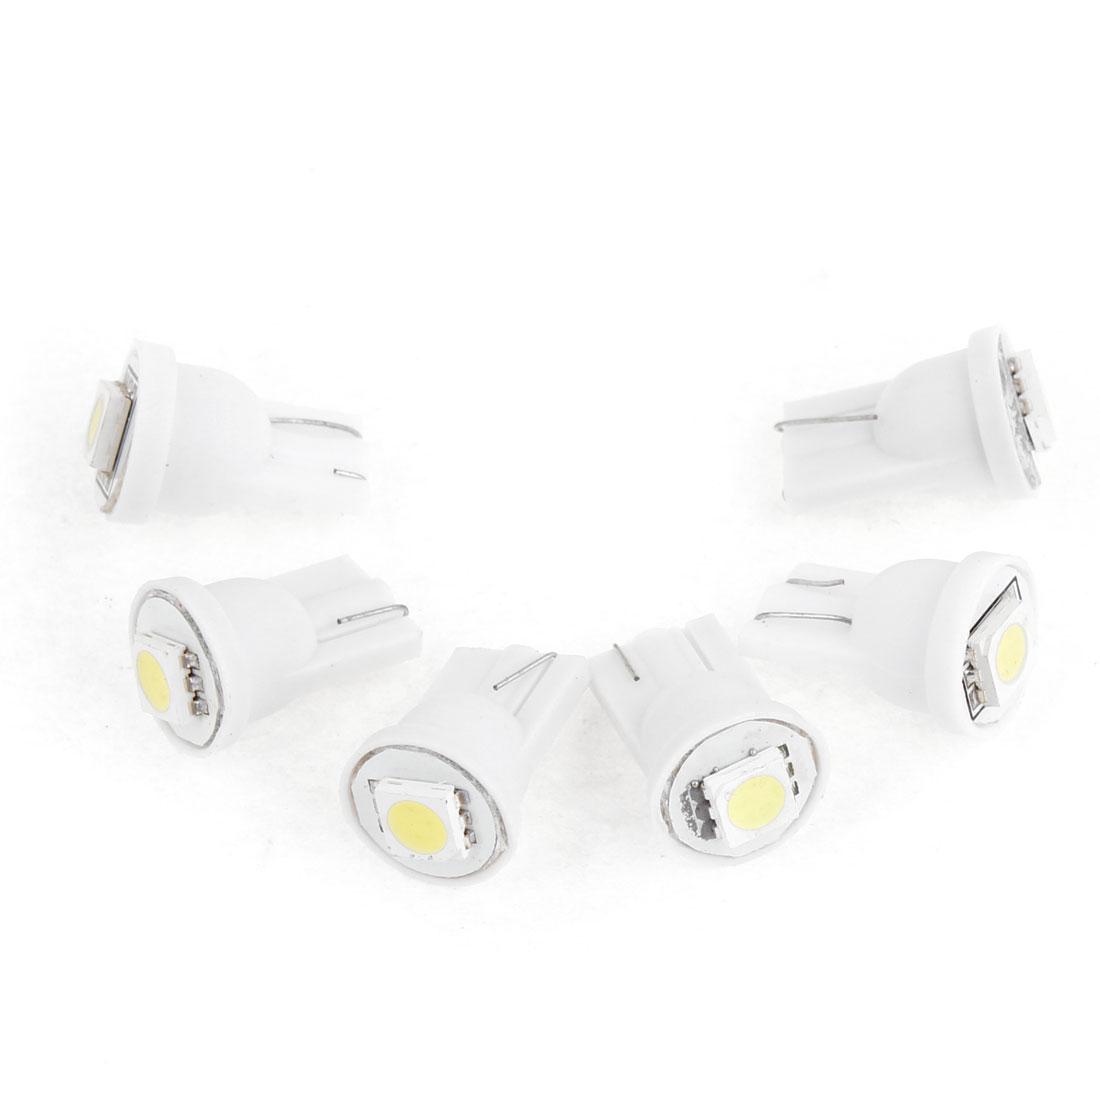 6 Pcs T10 5050 SMD White LED Instrument Board Light Bulb for Car internal